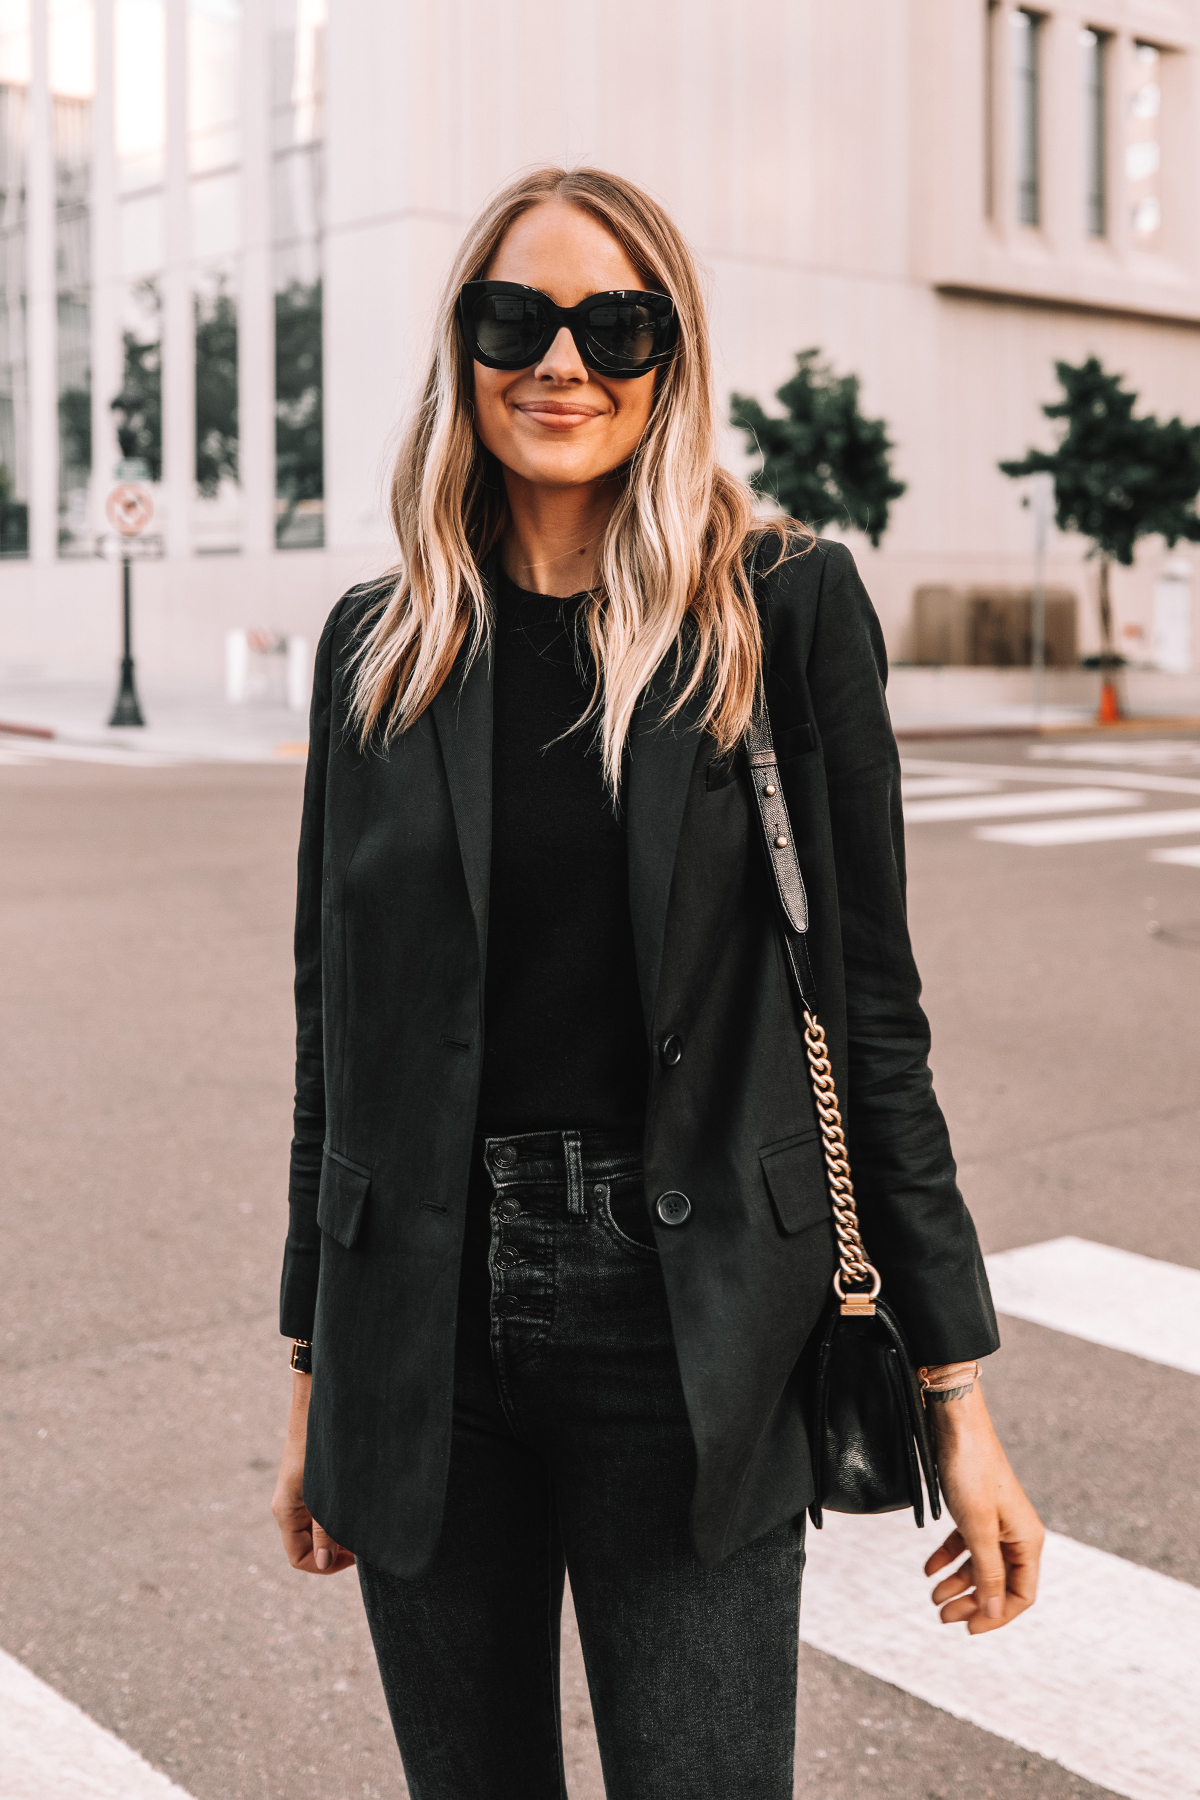 Fashion Jackson Wearing Everlane Black Blazer Everlane Black Sweater Black Skinny Jeans